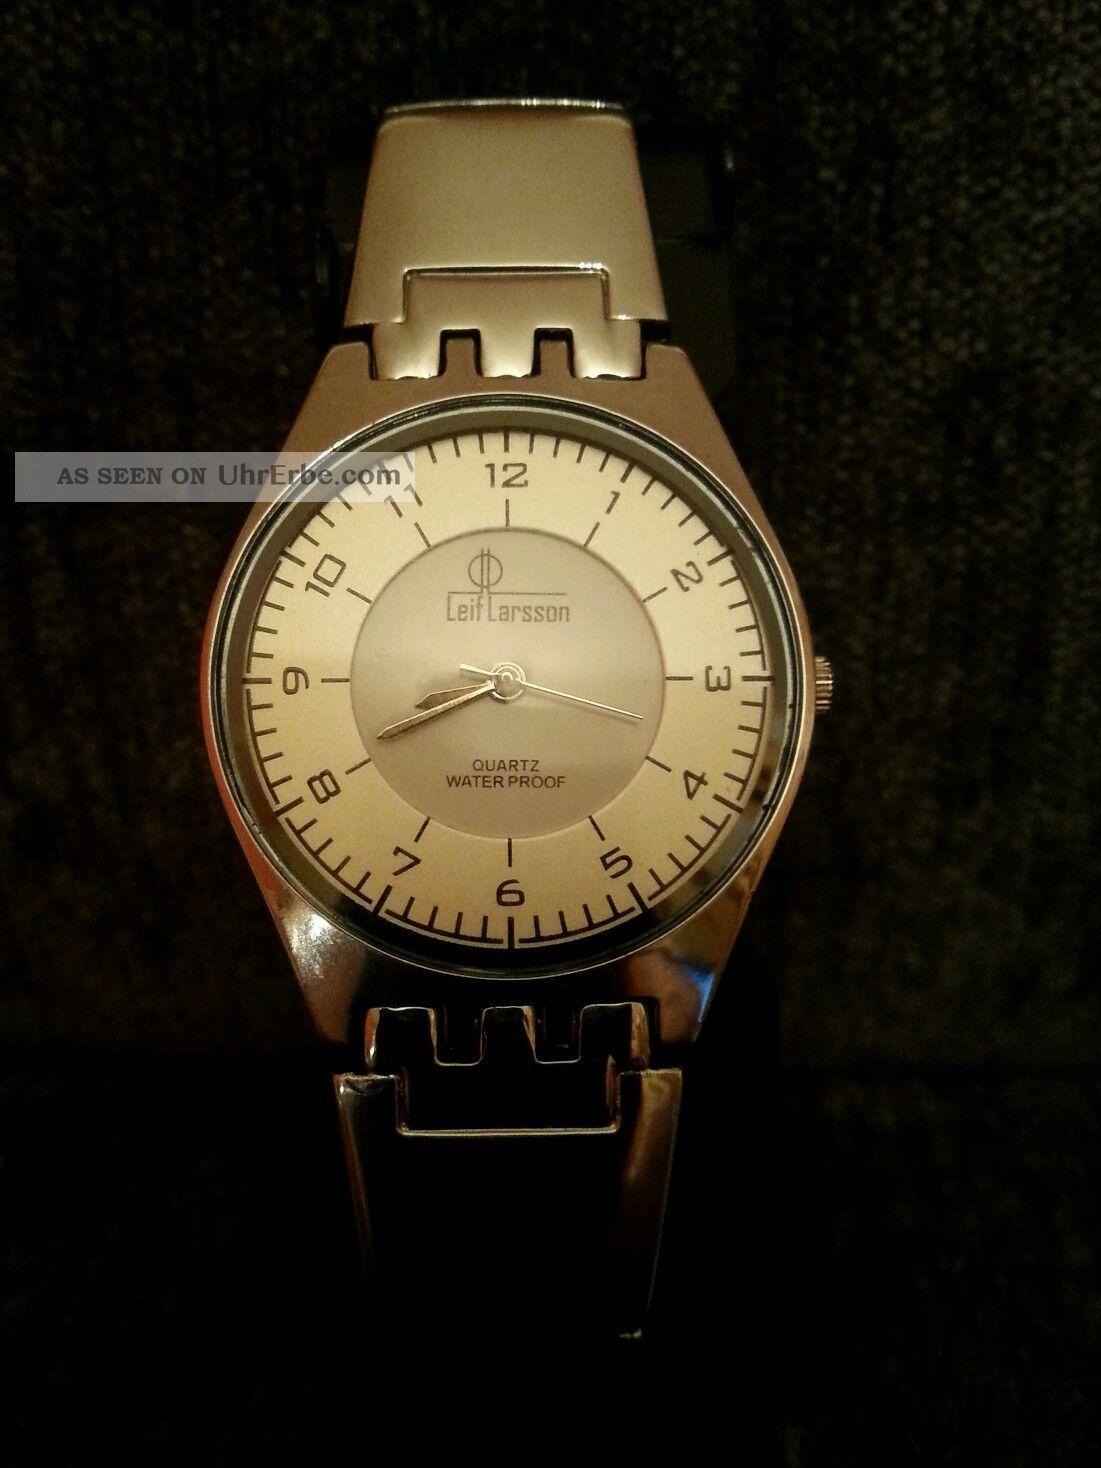 Leif Larsson Armbanduhr Armbanduhren Bild